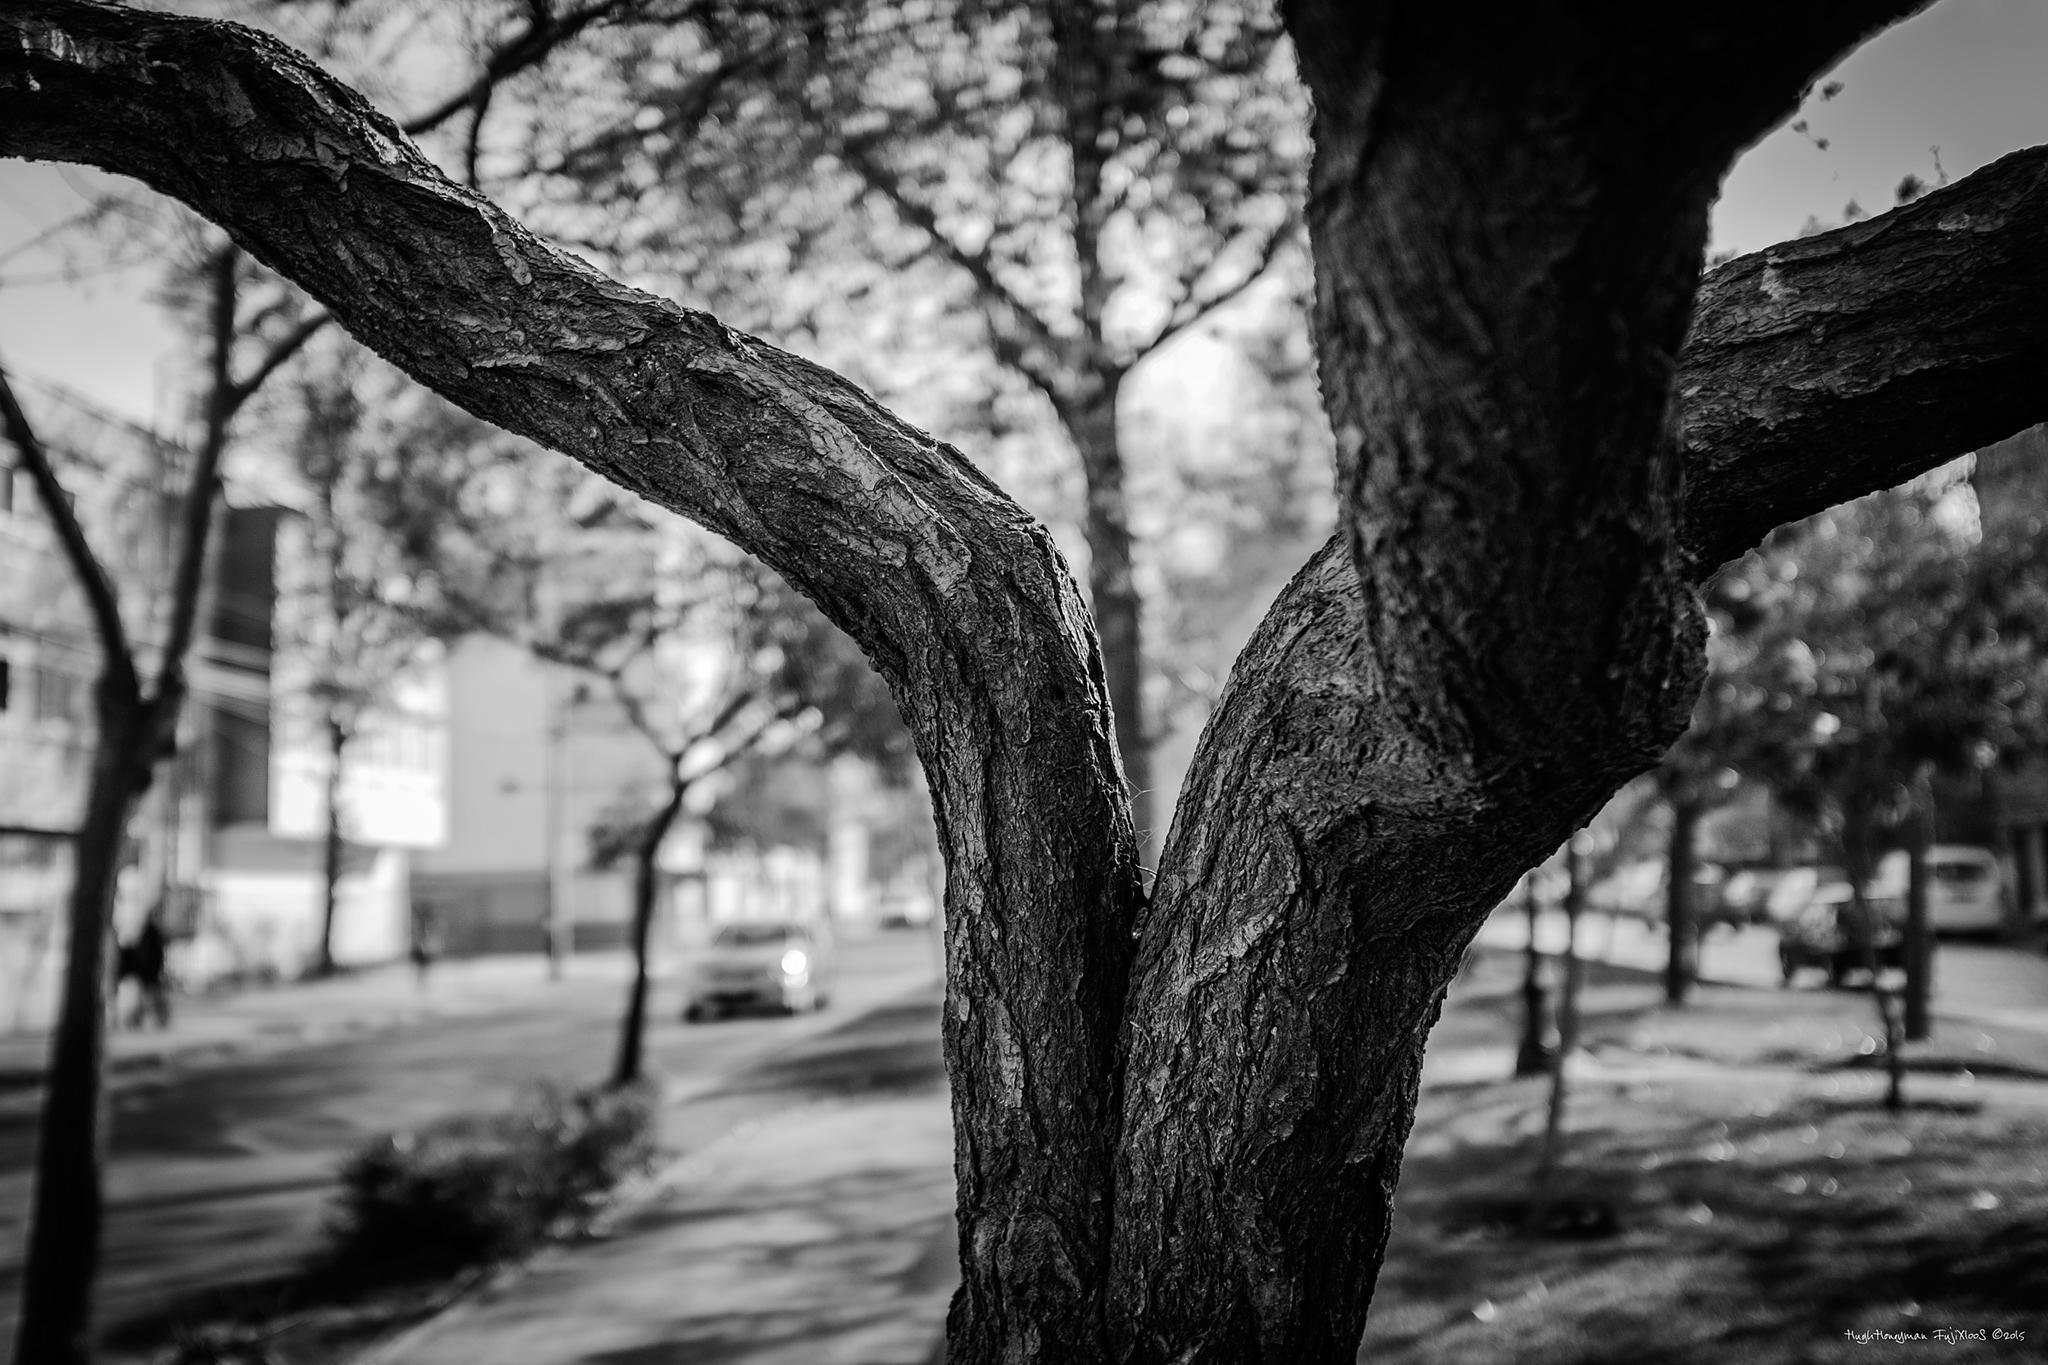 This is a Tree by Hugh Honeyman